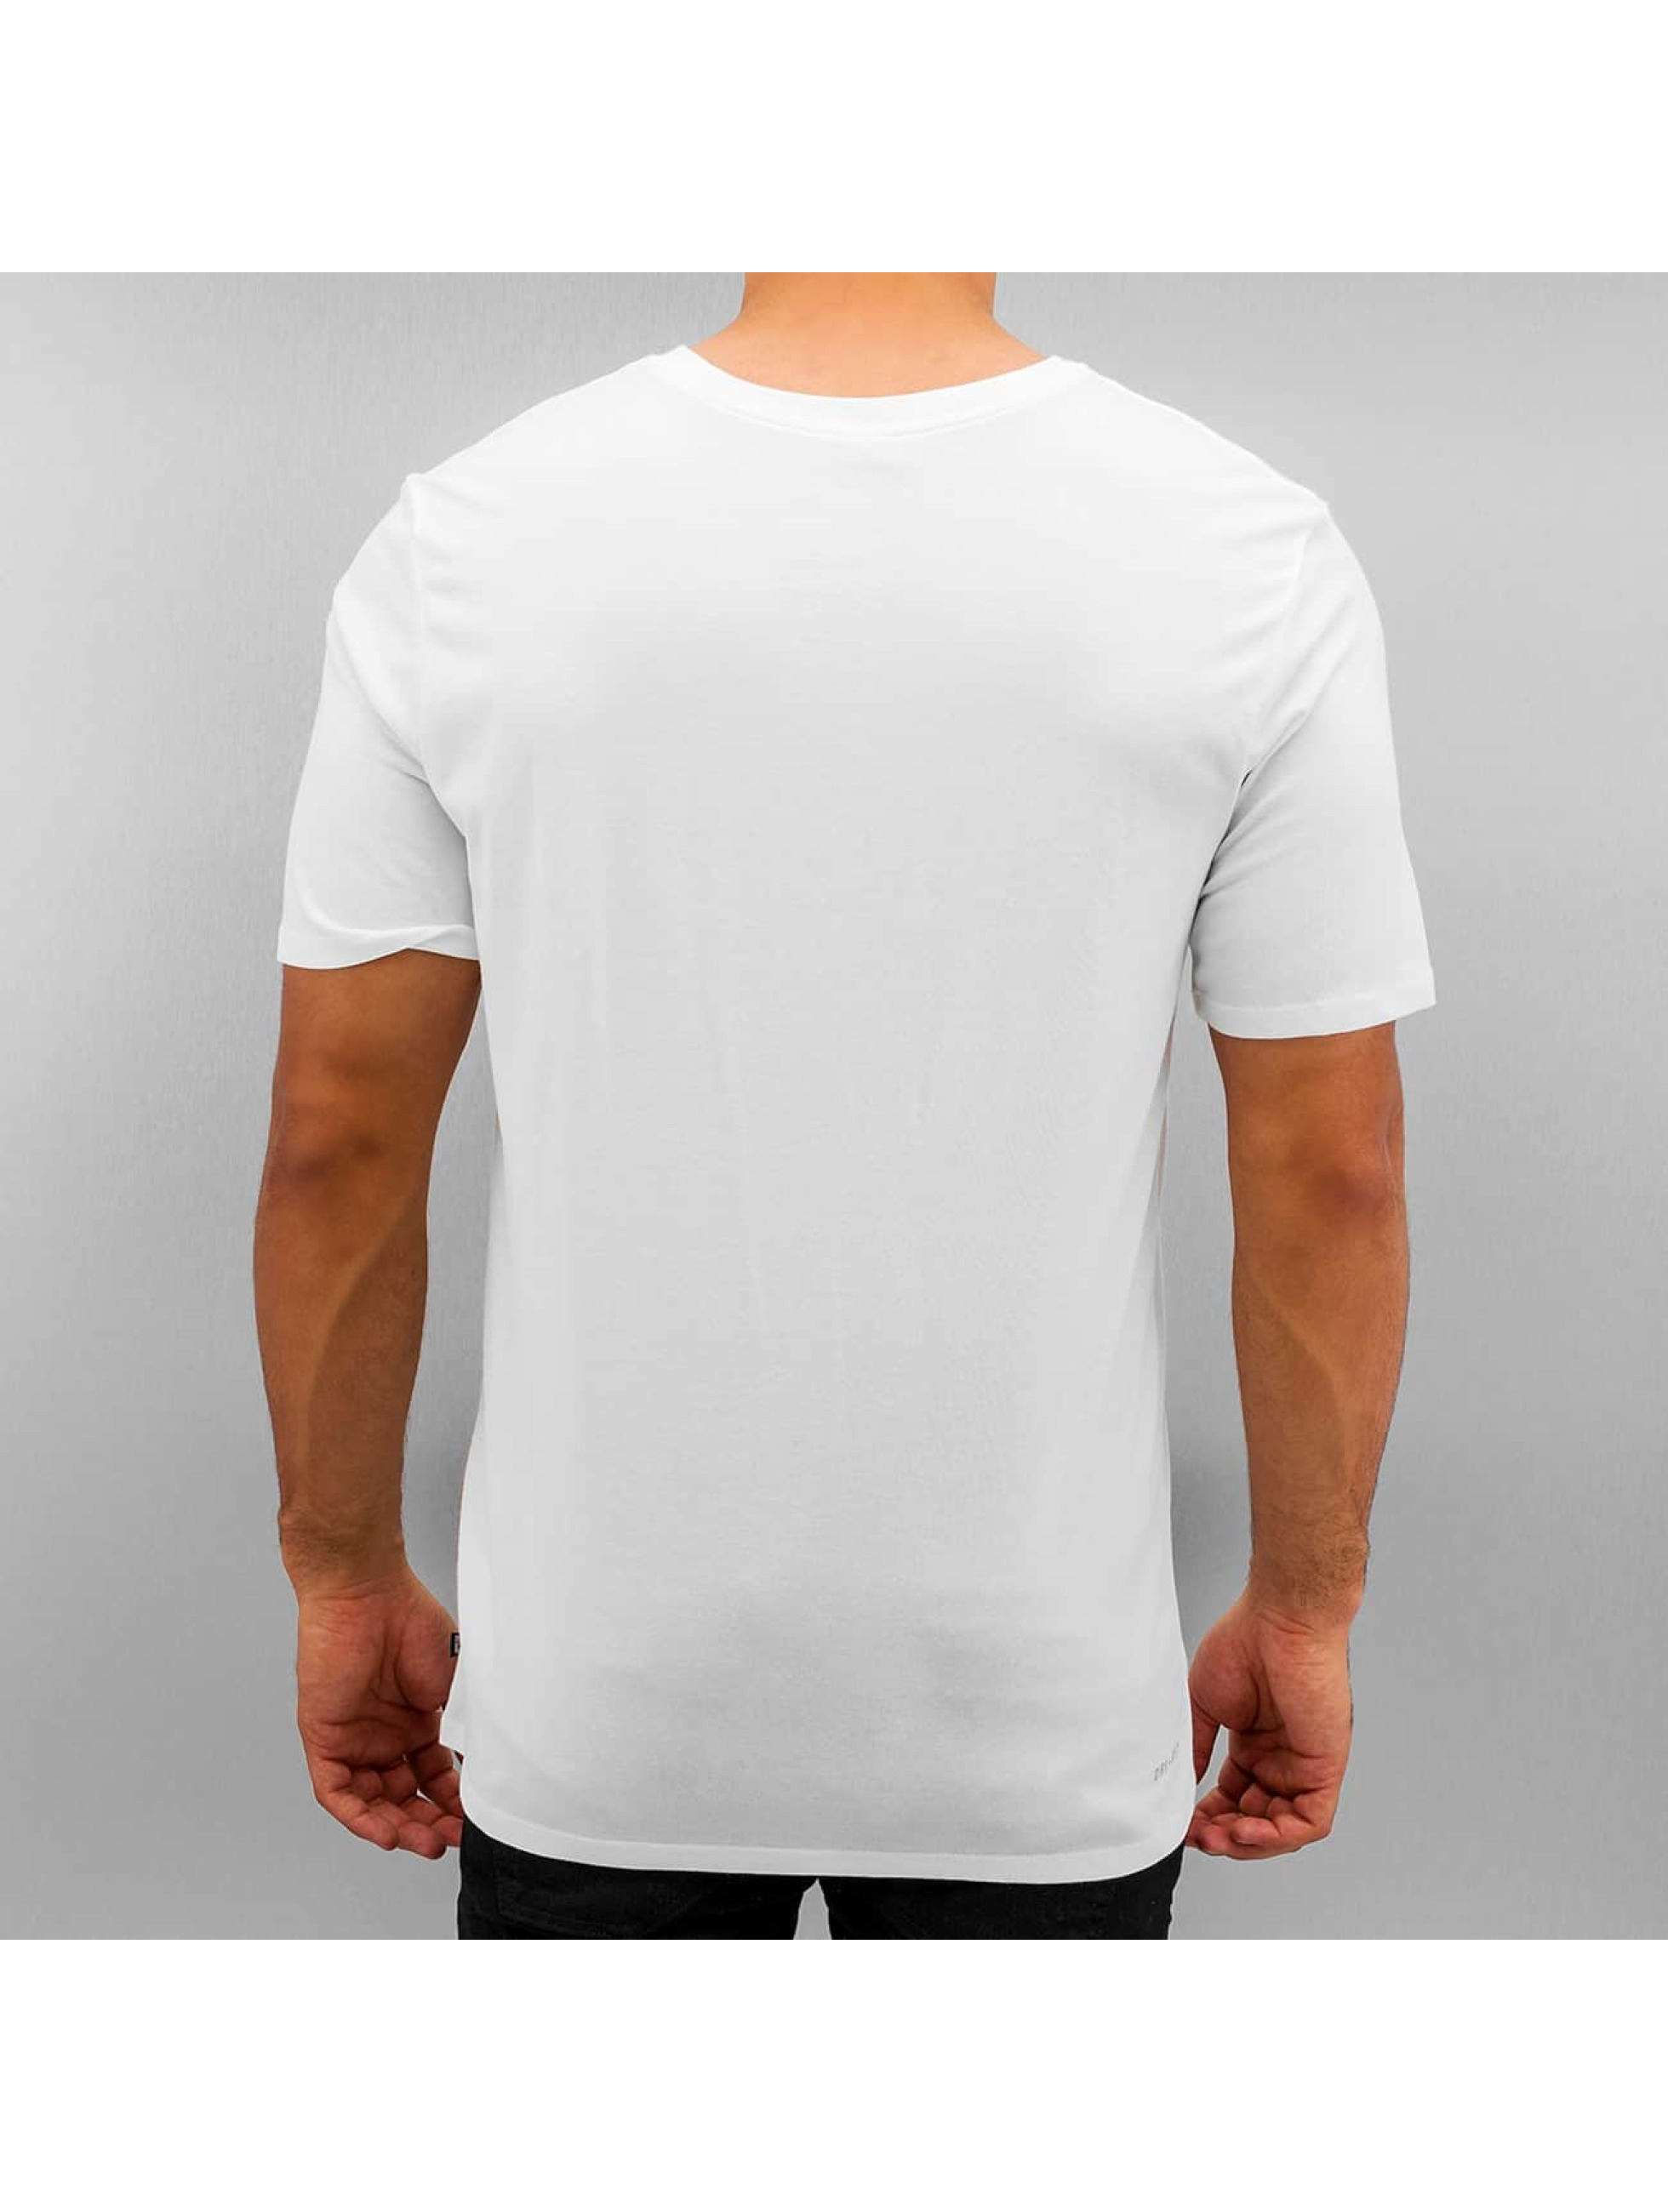 nike sb herren t shirt sb logo in wei 258066. Black Bedroom Furniture Sets. Home Design Ideas